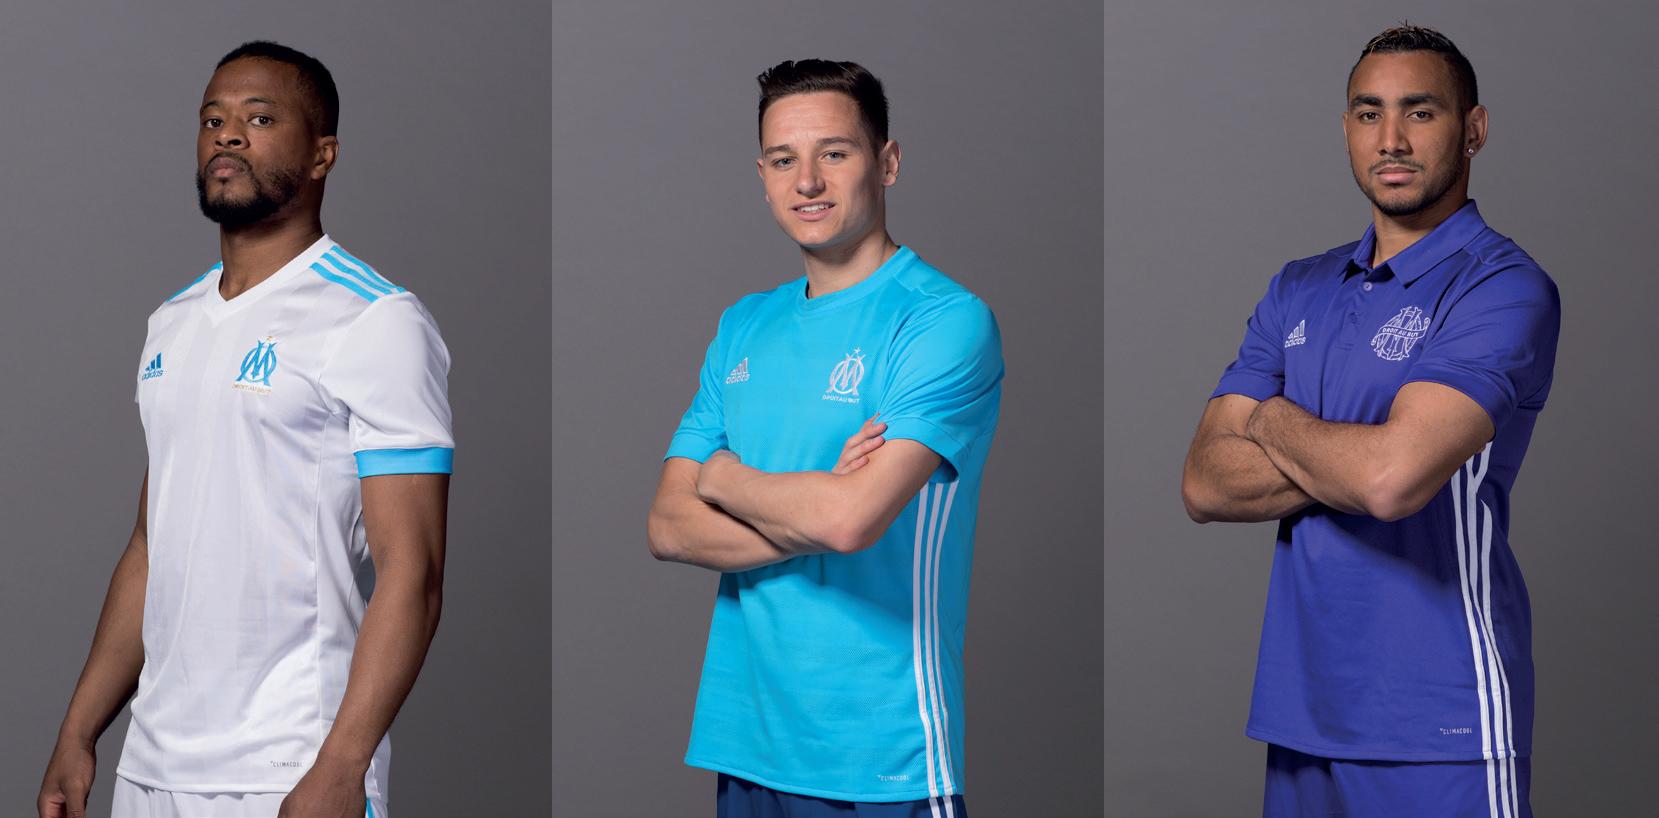 http://www.sportbuzzbusiness.fr/wp-content/uploads/2017/05/nouveaux-maillots-Olympique-de-marseille-2017-2018-adidas-football.jpg